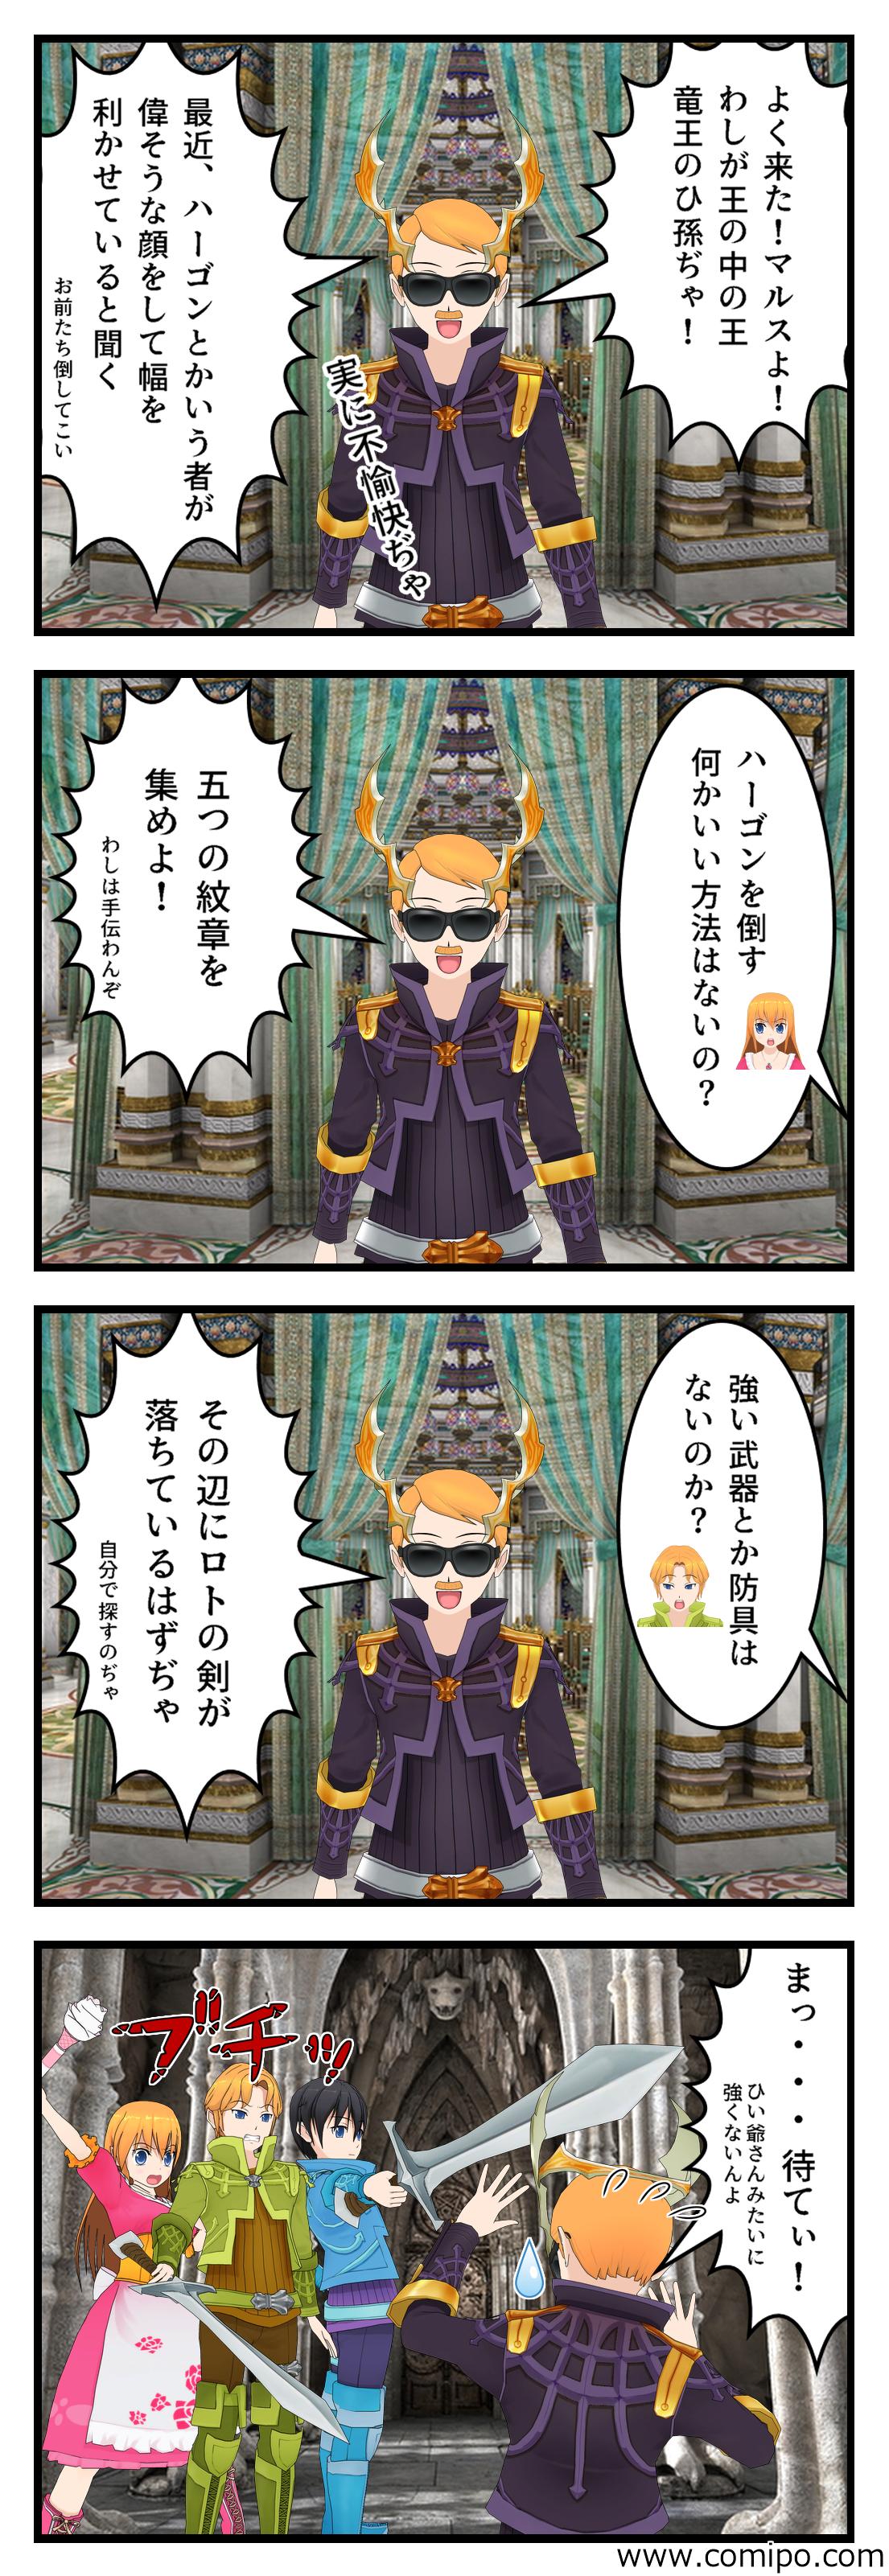 https://cdn-ak.f.st-hatena.com/images/fotolife/t/tomohiko37_i/20200926/20200926224248.png